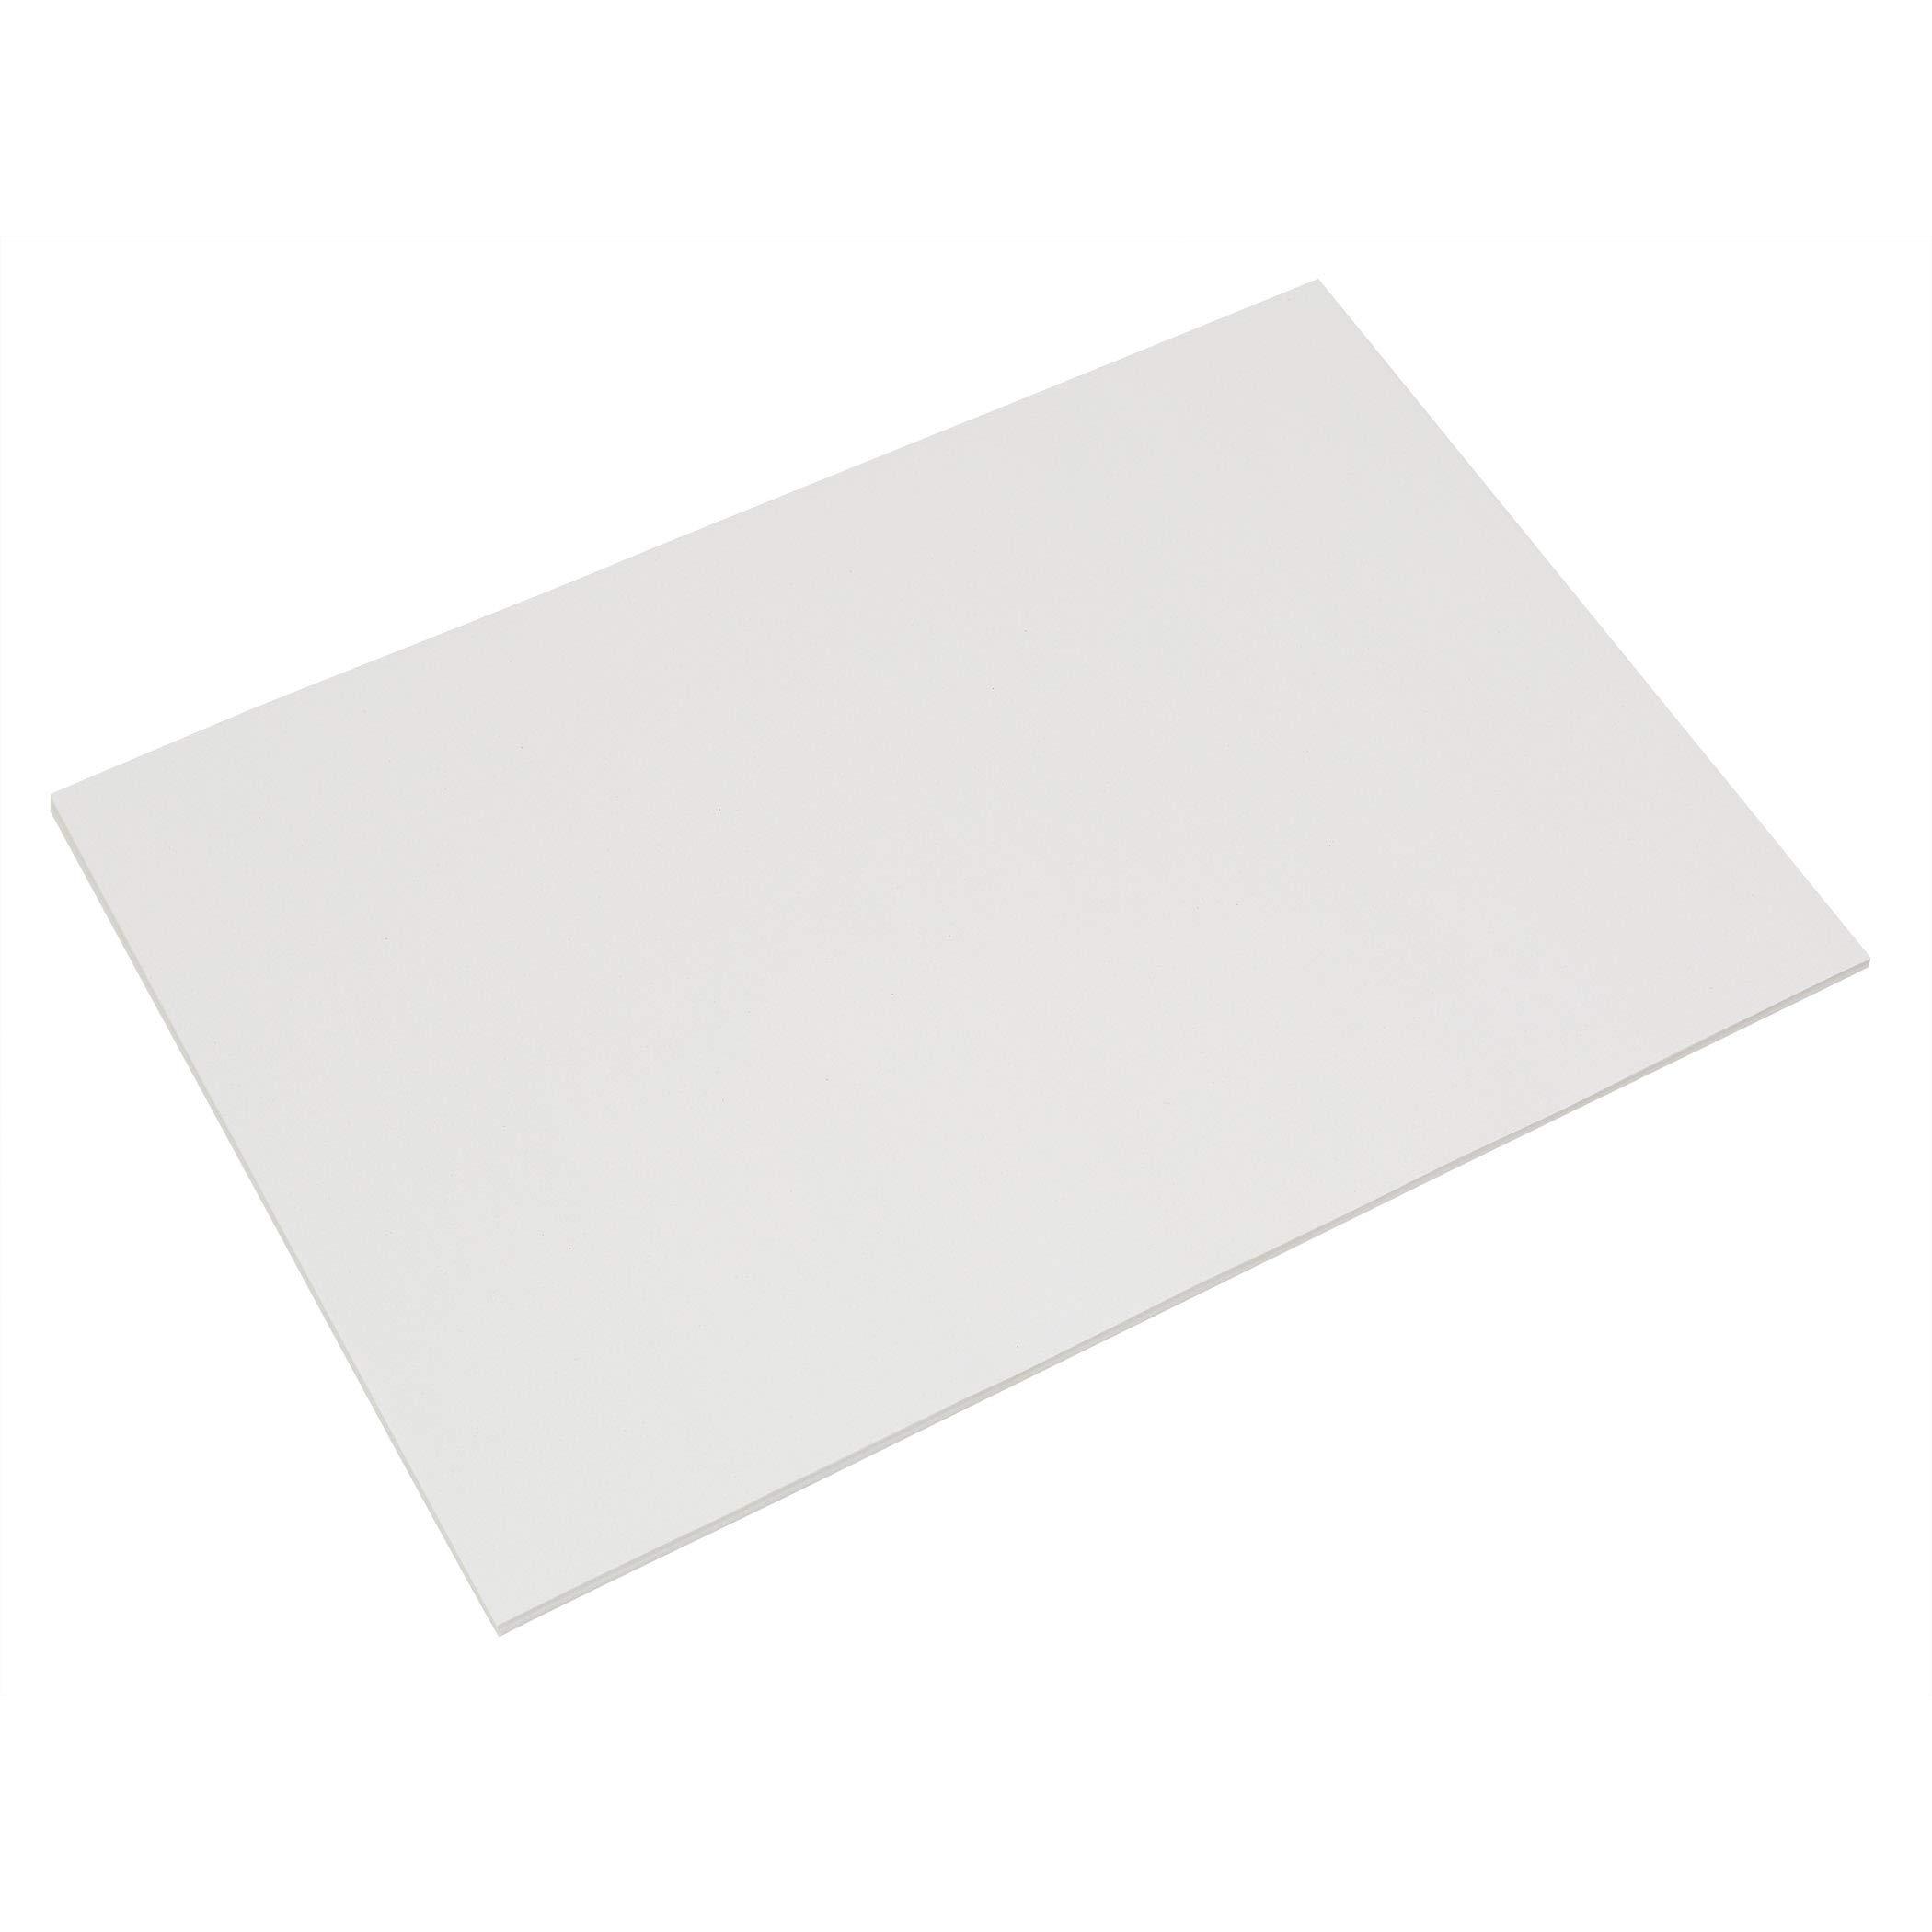 Pacon PAC5316BN Fingerpaint Paper, White, 16'' x 22'', 100 Sheets Per Pack, 3 Packs